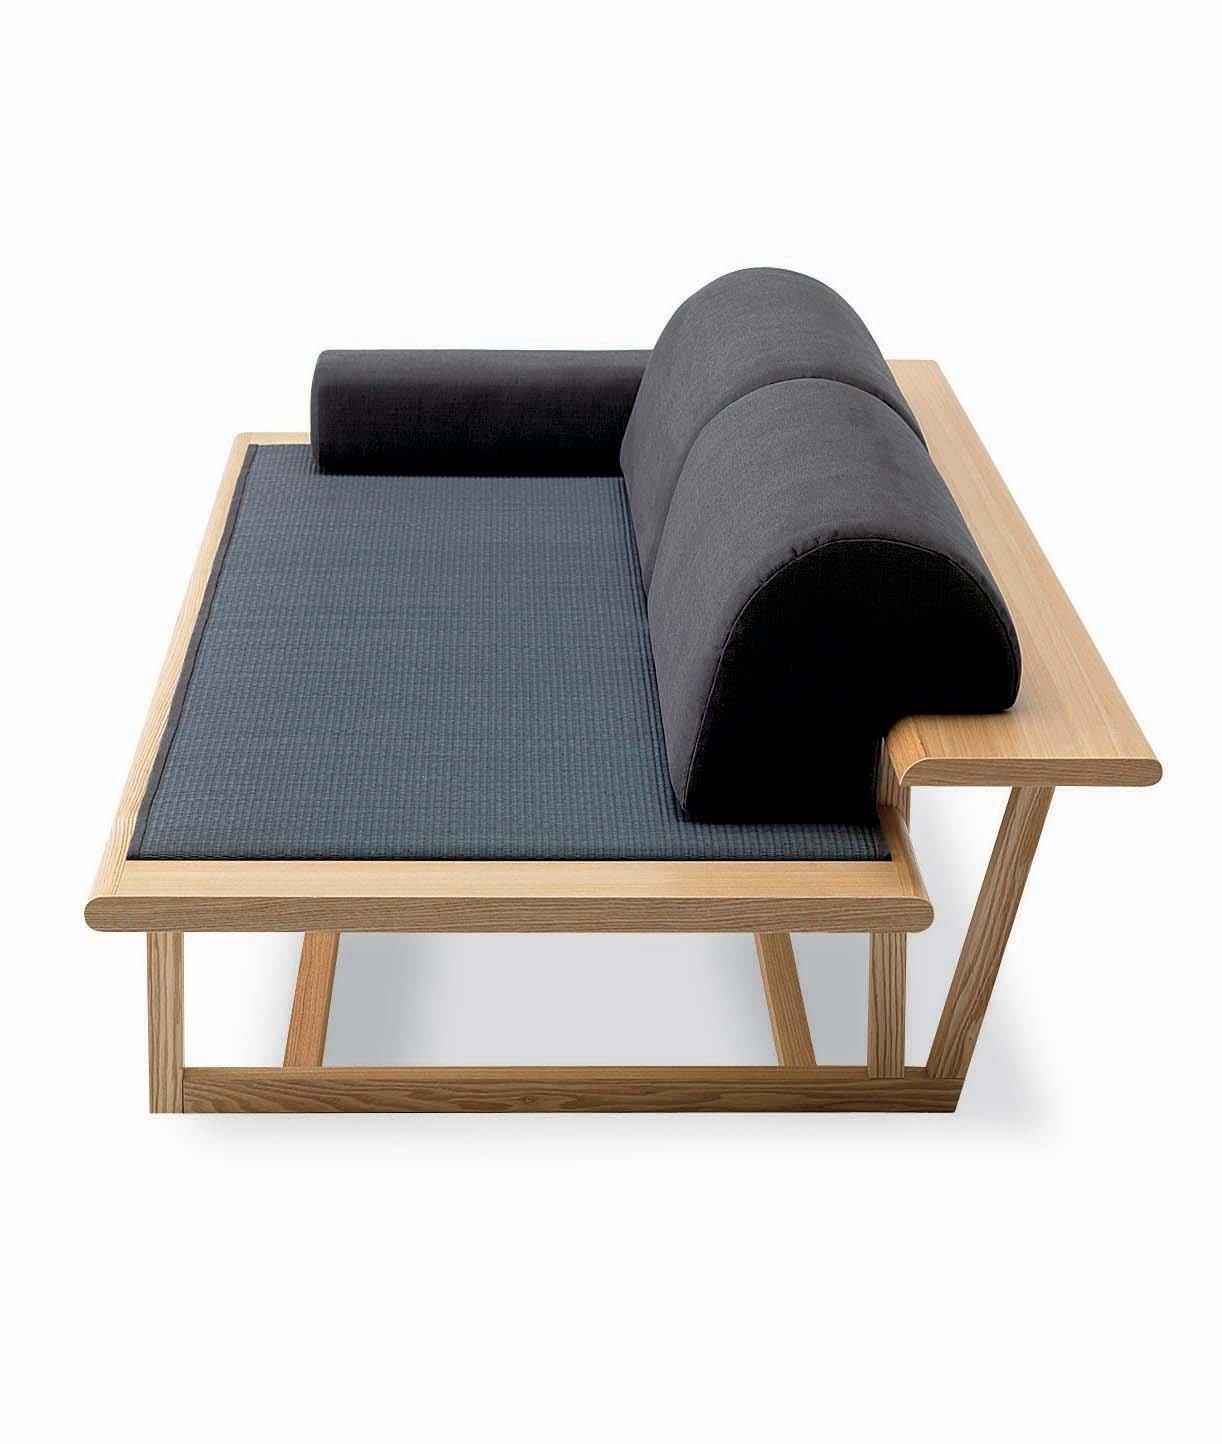 Tatami Japanese Style Sofa High Design Made In Japan Buy Japanese Tatami StyleHigh Design